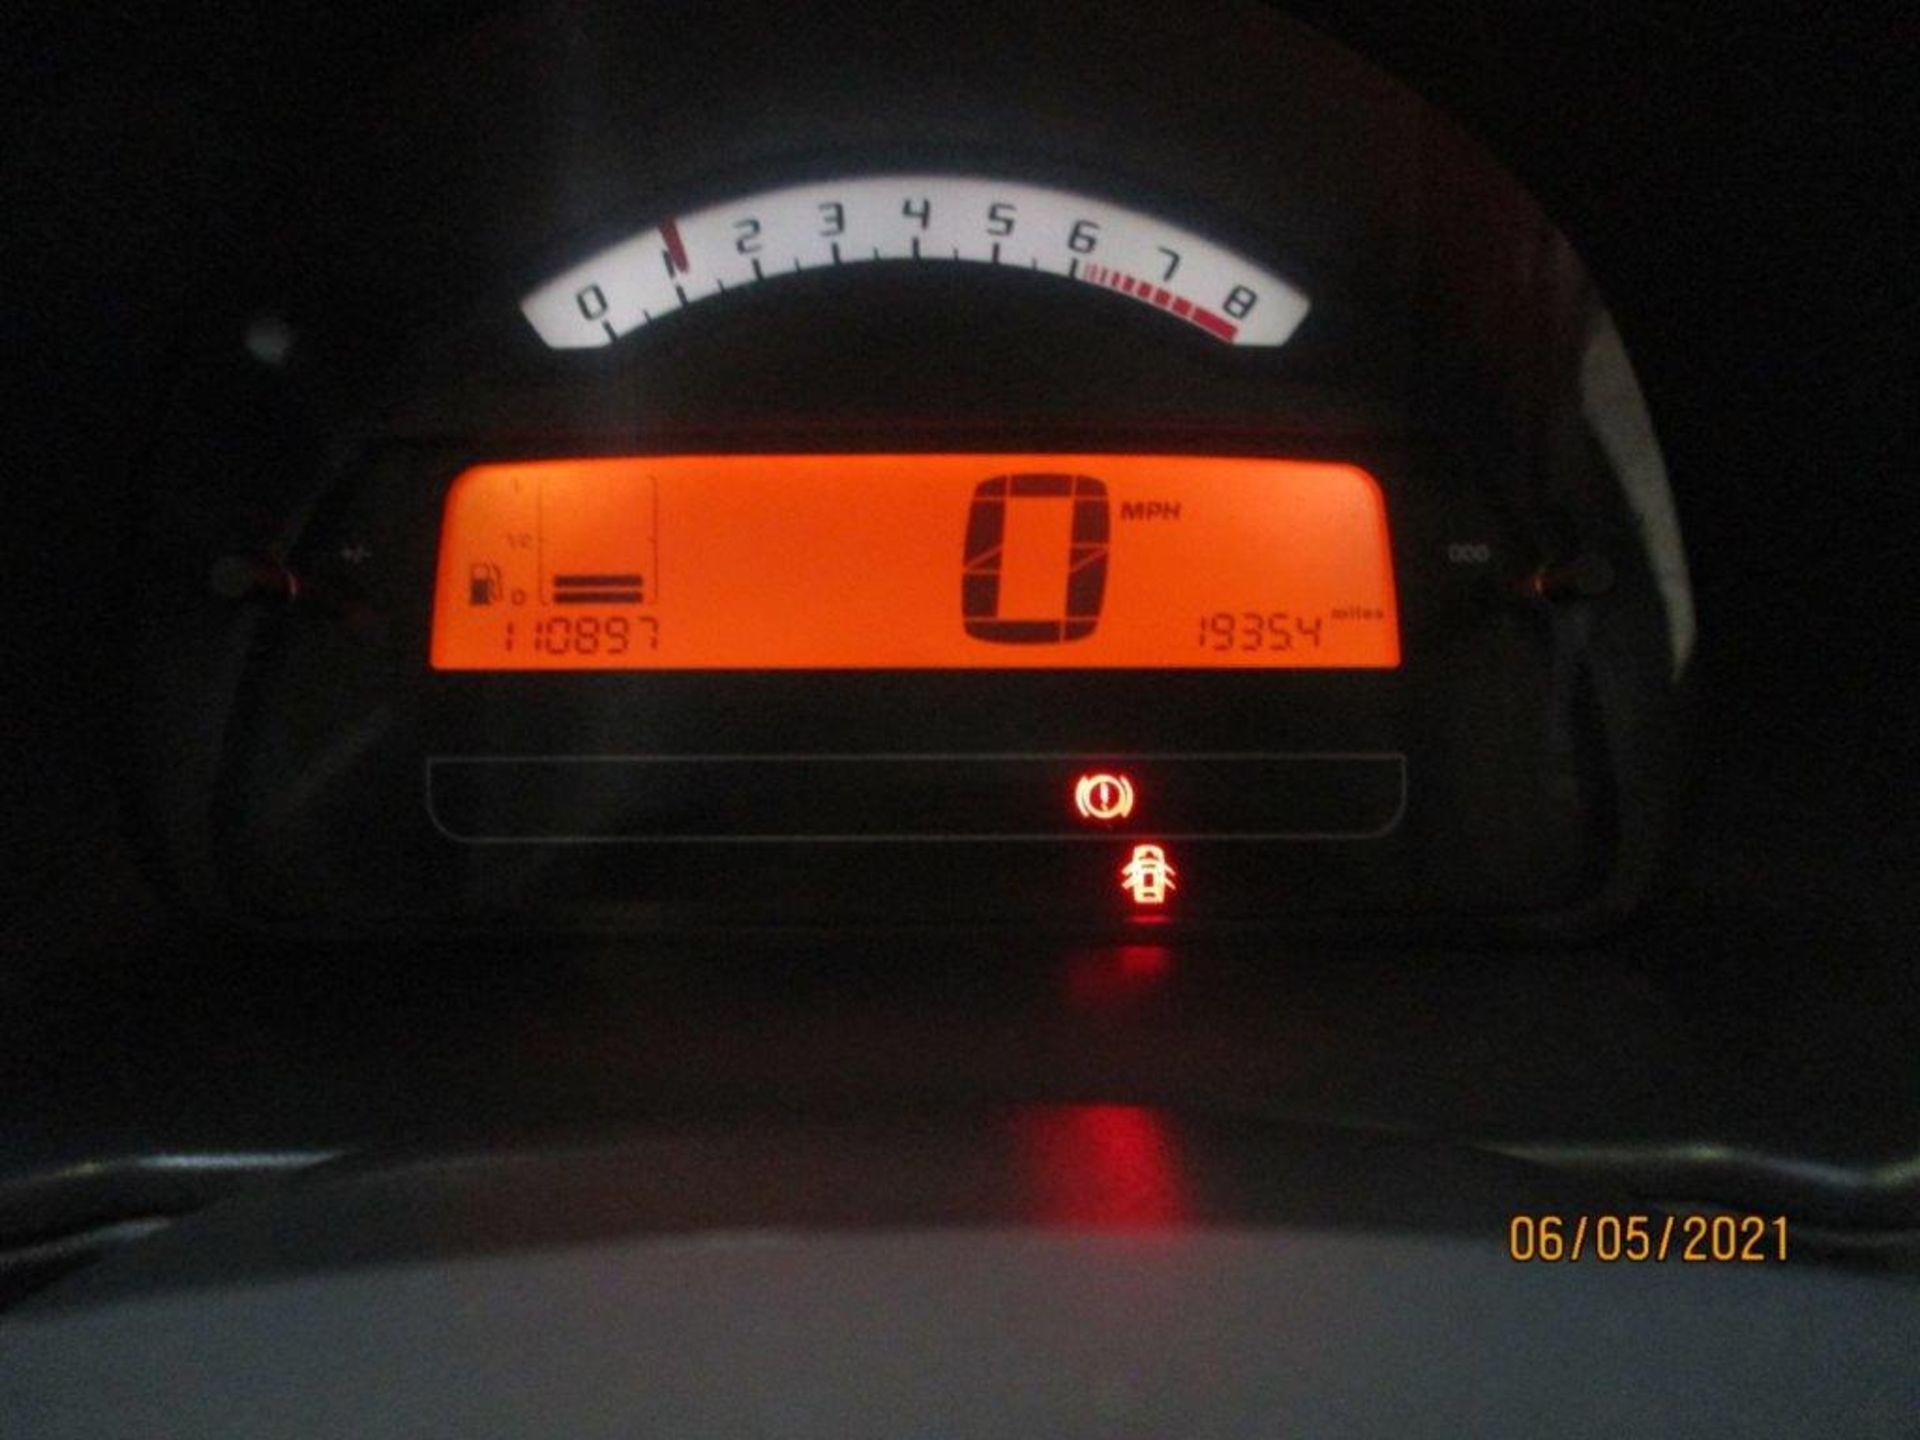 06 56 Citroen C3 DESIRE - Image 11 of 15